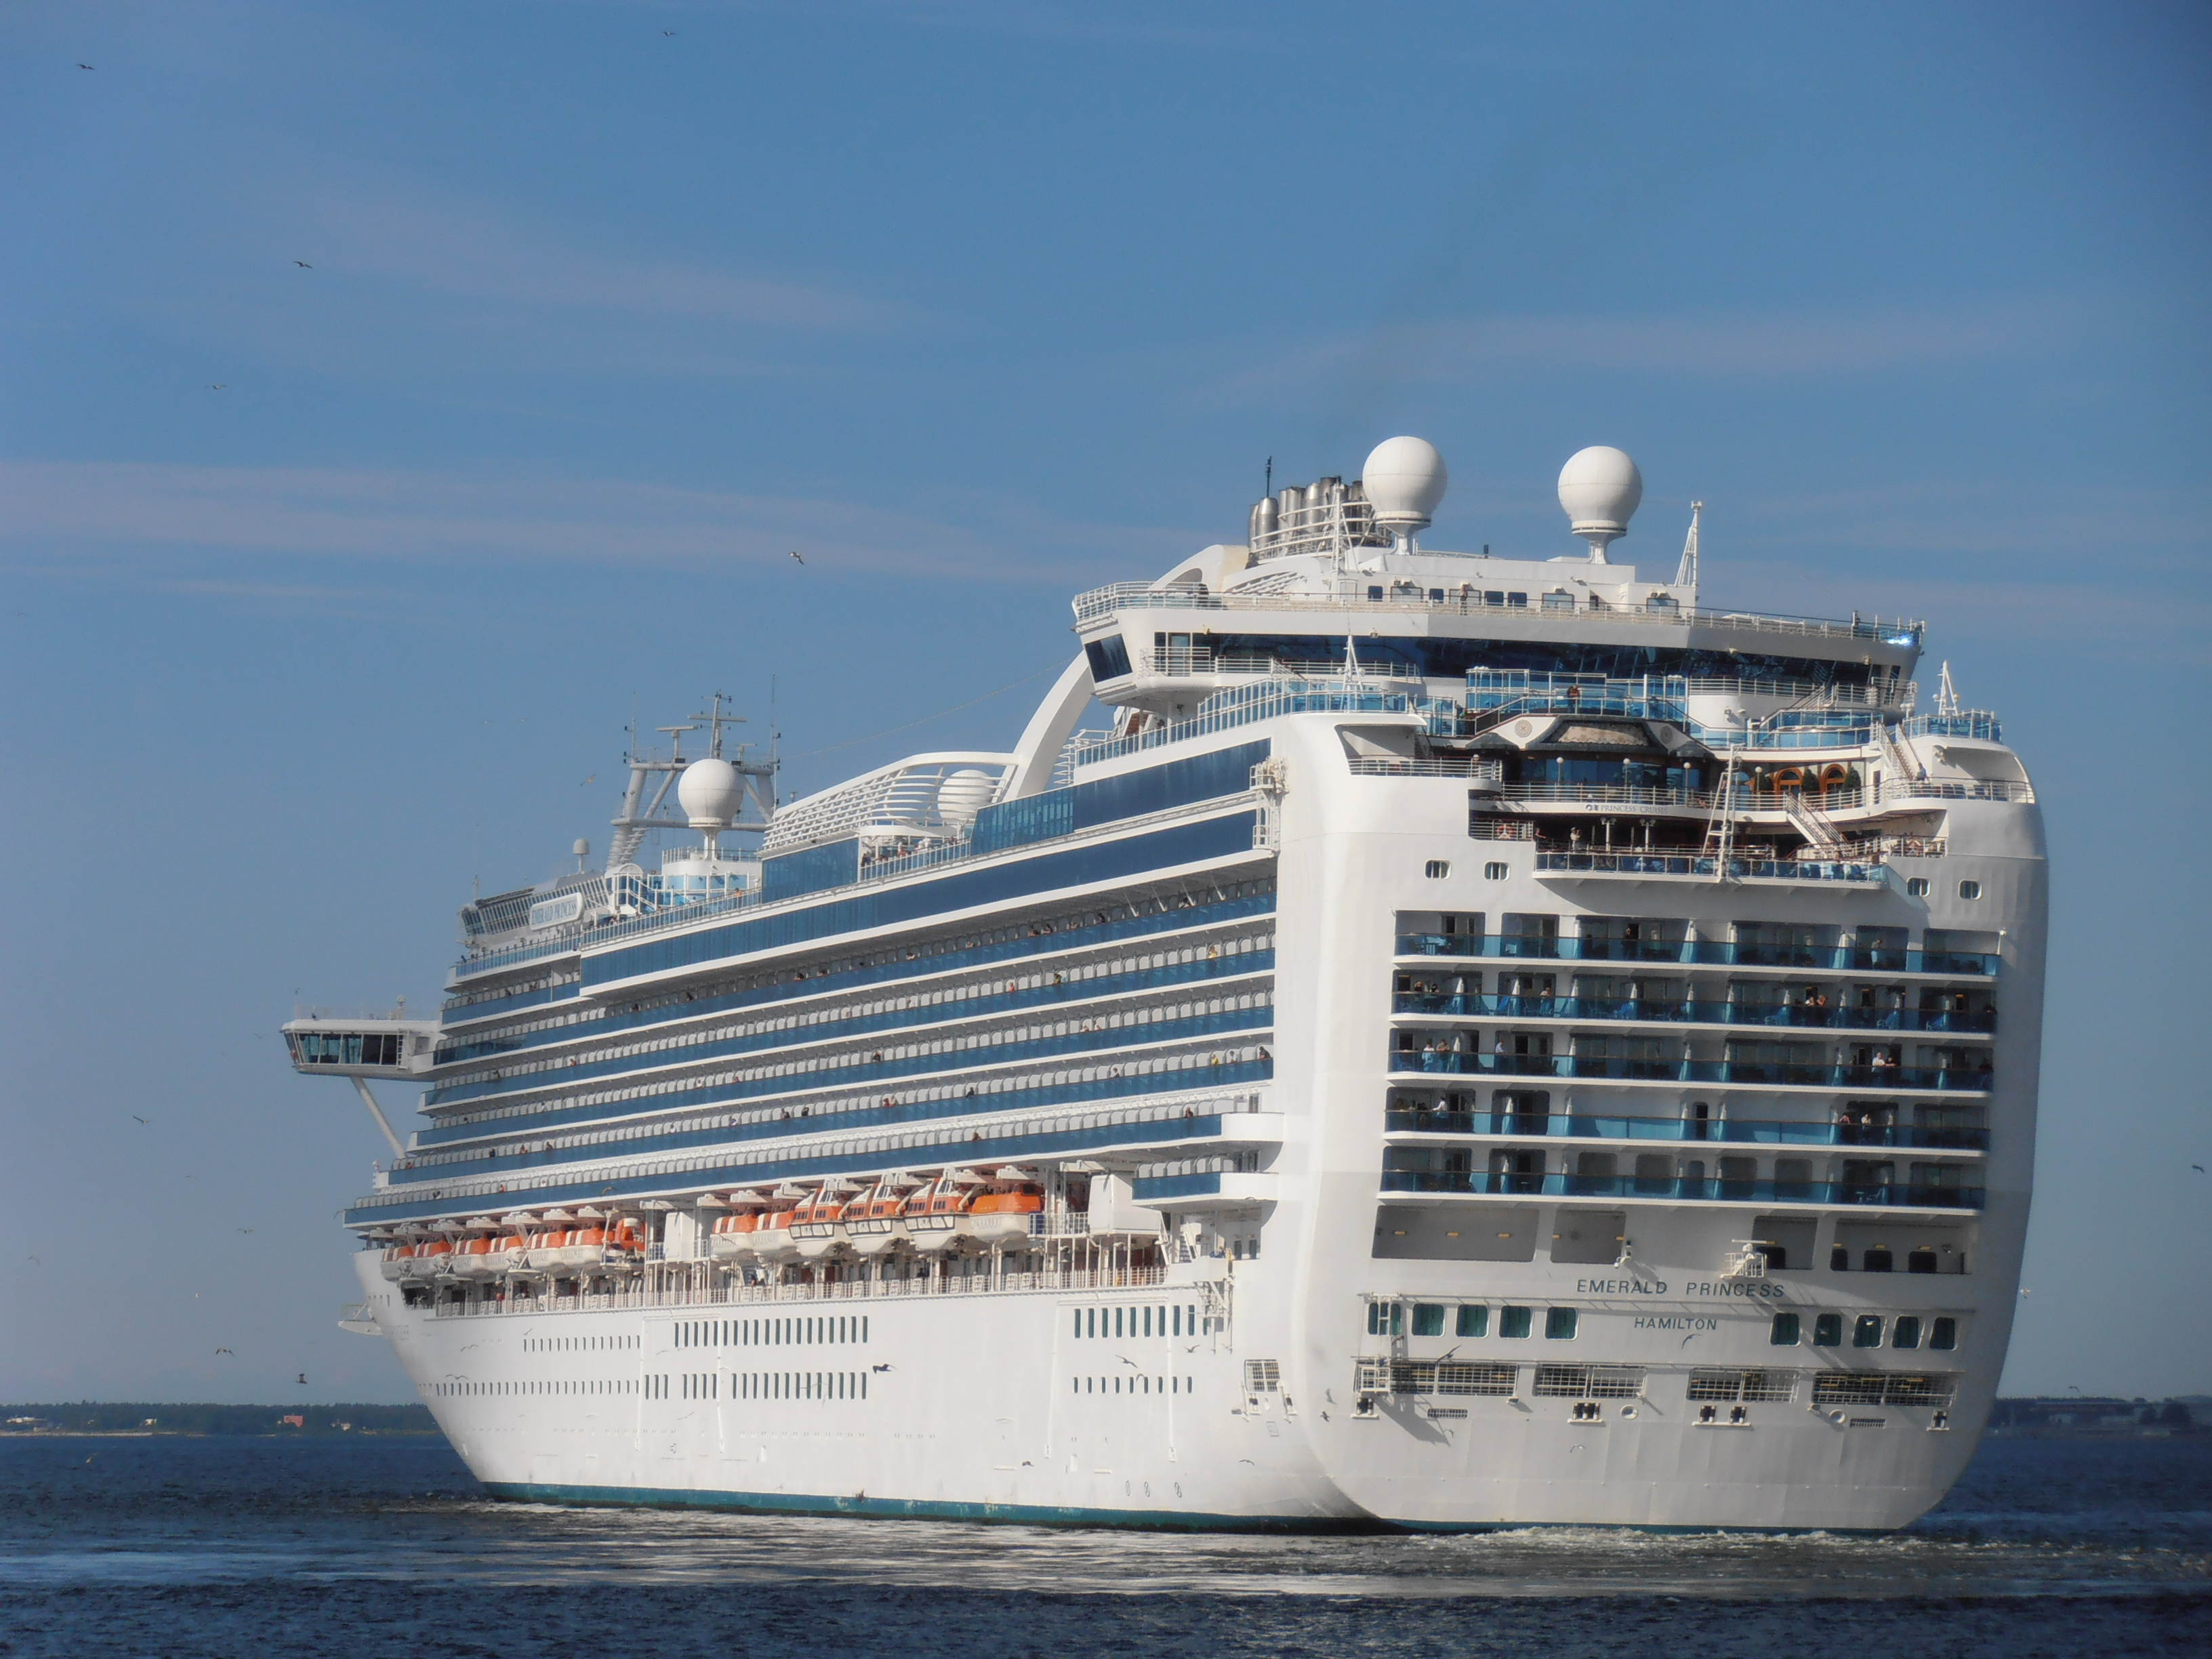 File:Emerald Princess departing Tallinn 2 August 2012.JPG ...